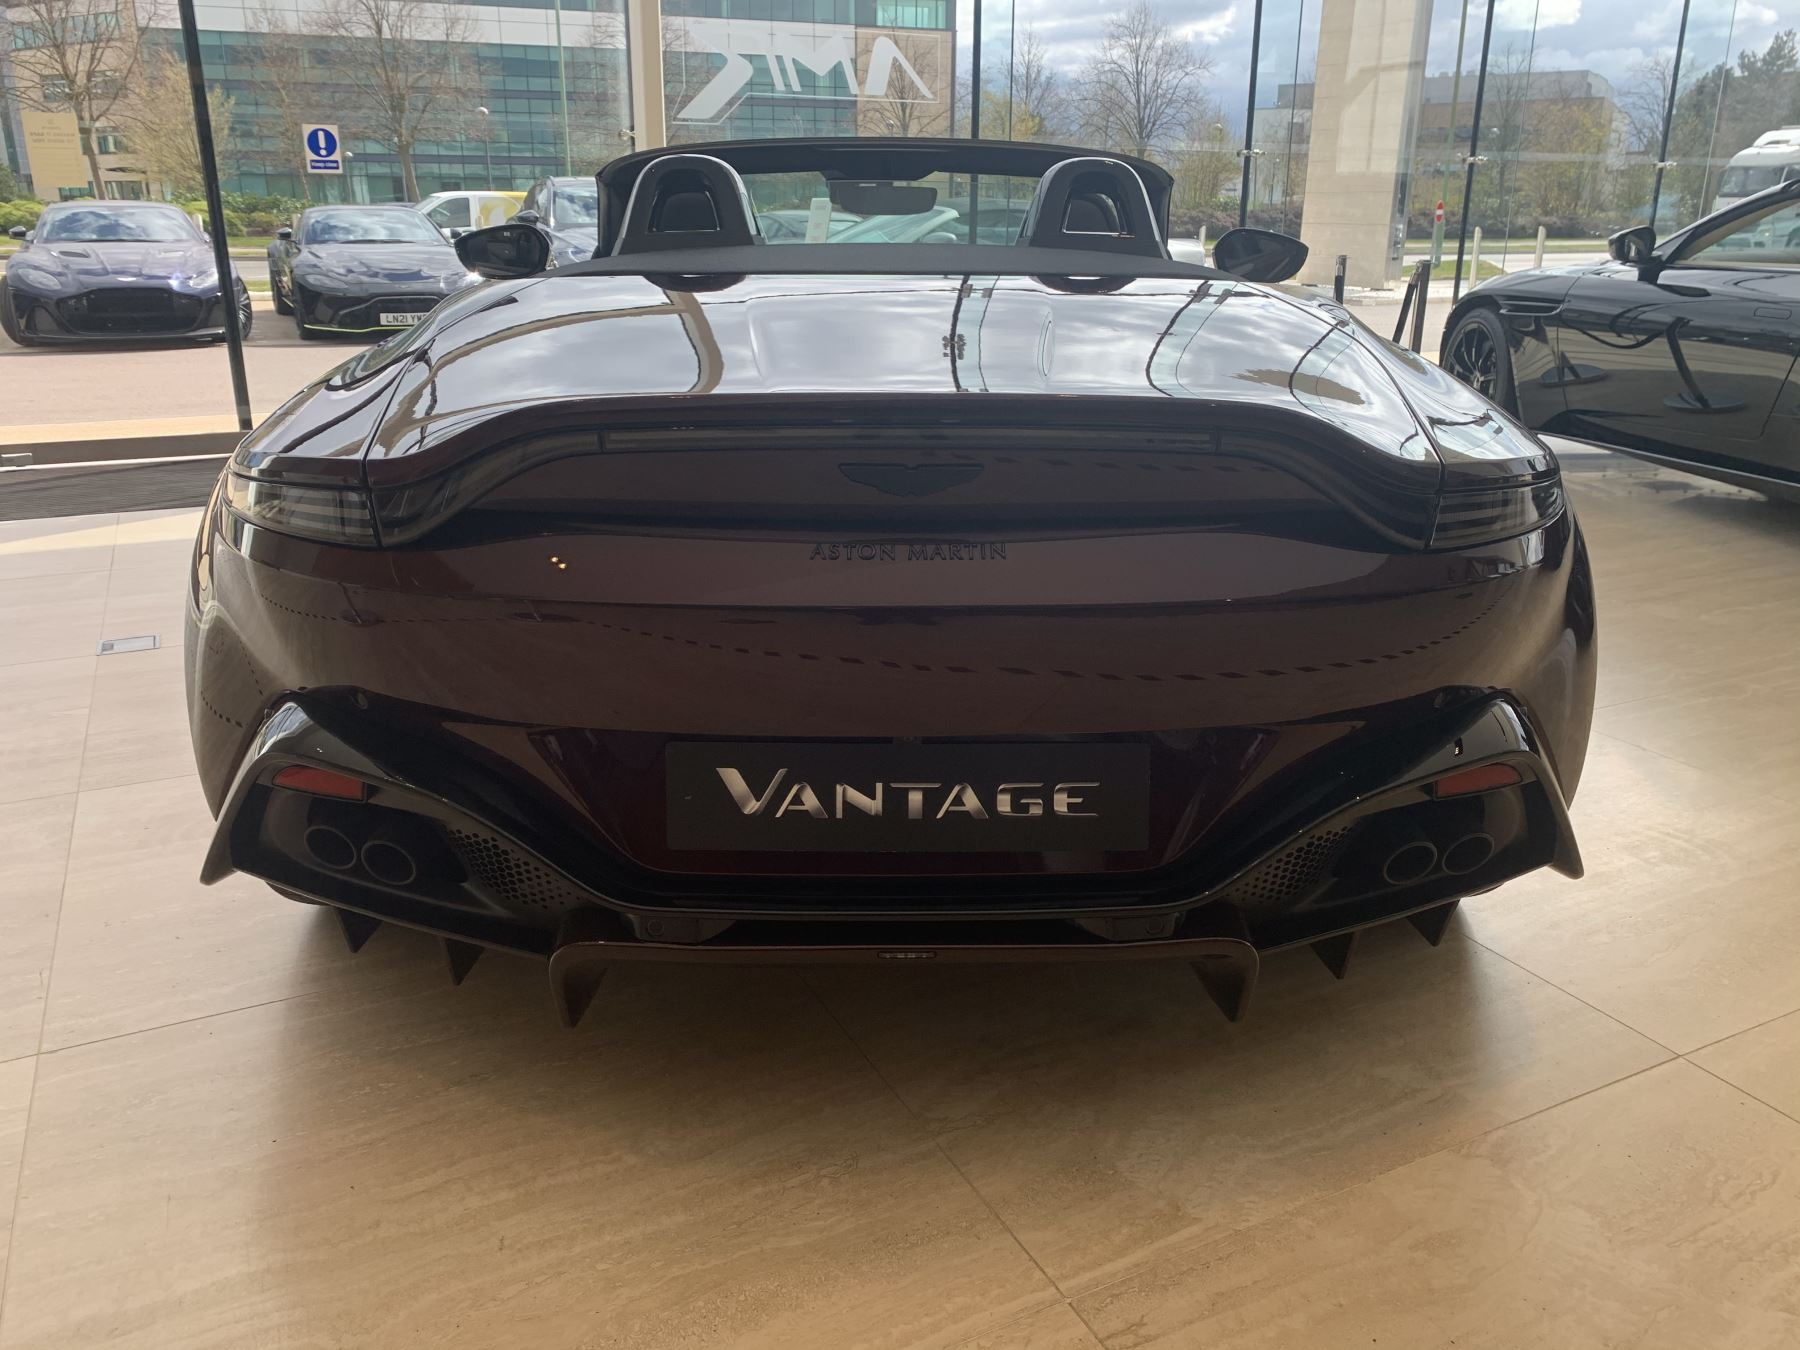 Aston Martin V8 Vantage Convertible Touchtronic 3 image 4